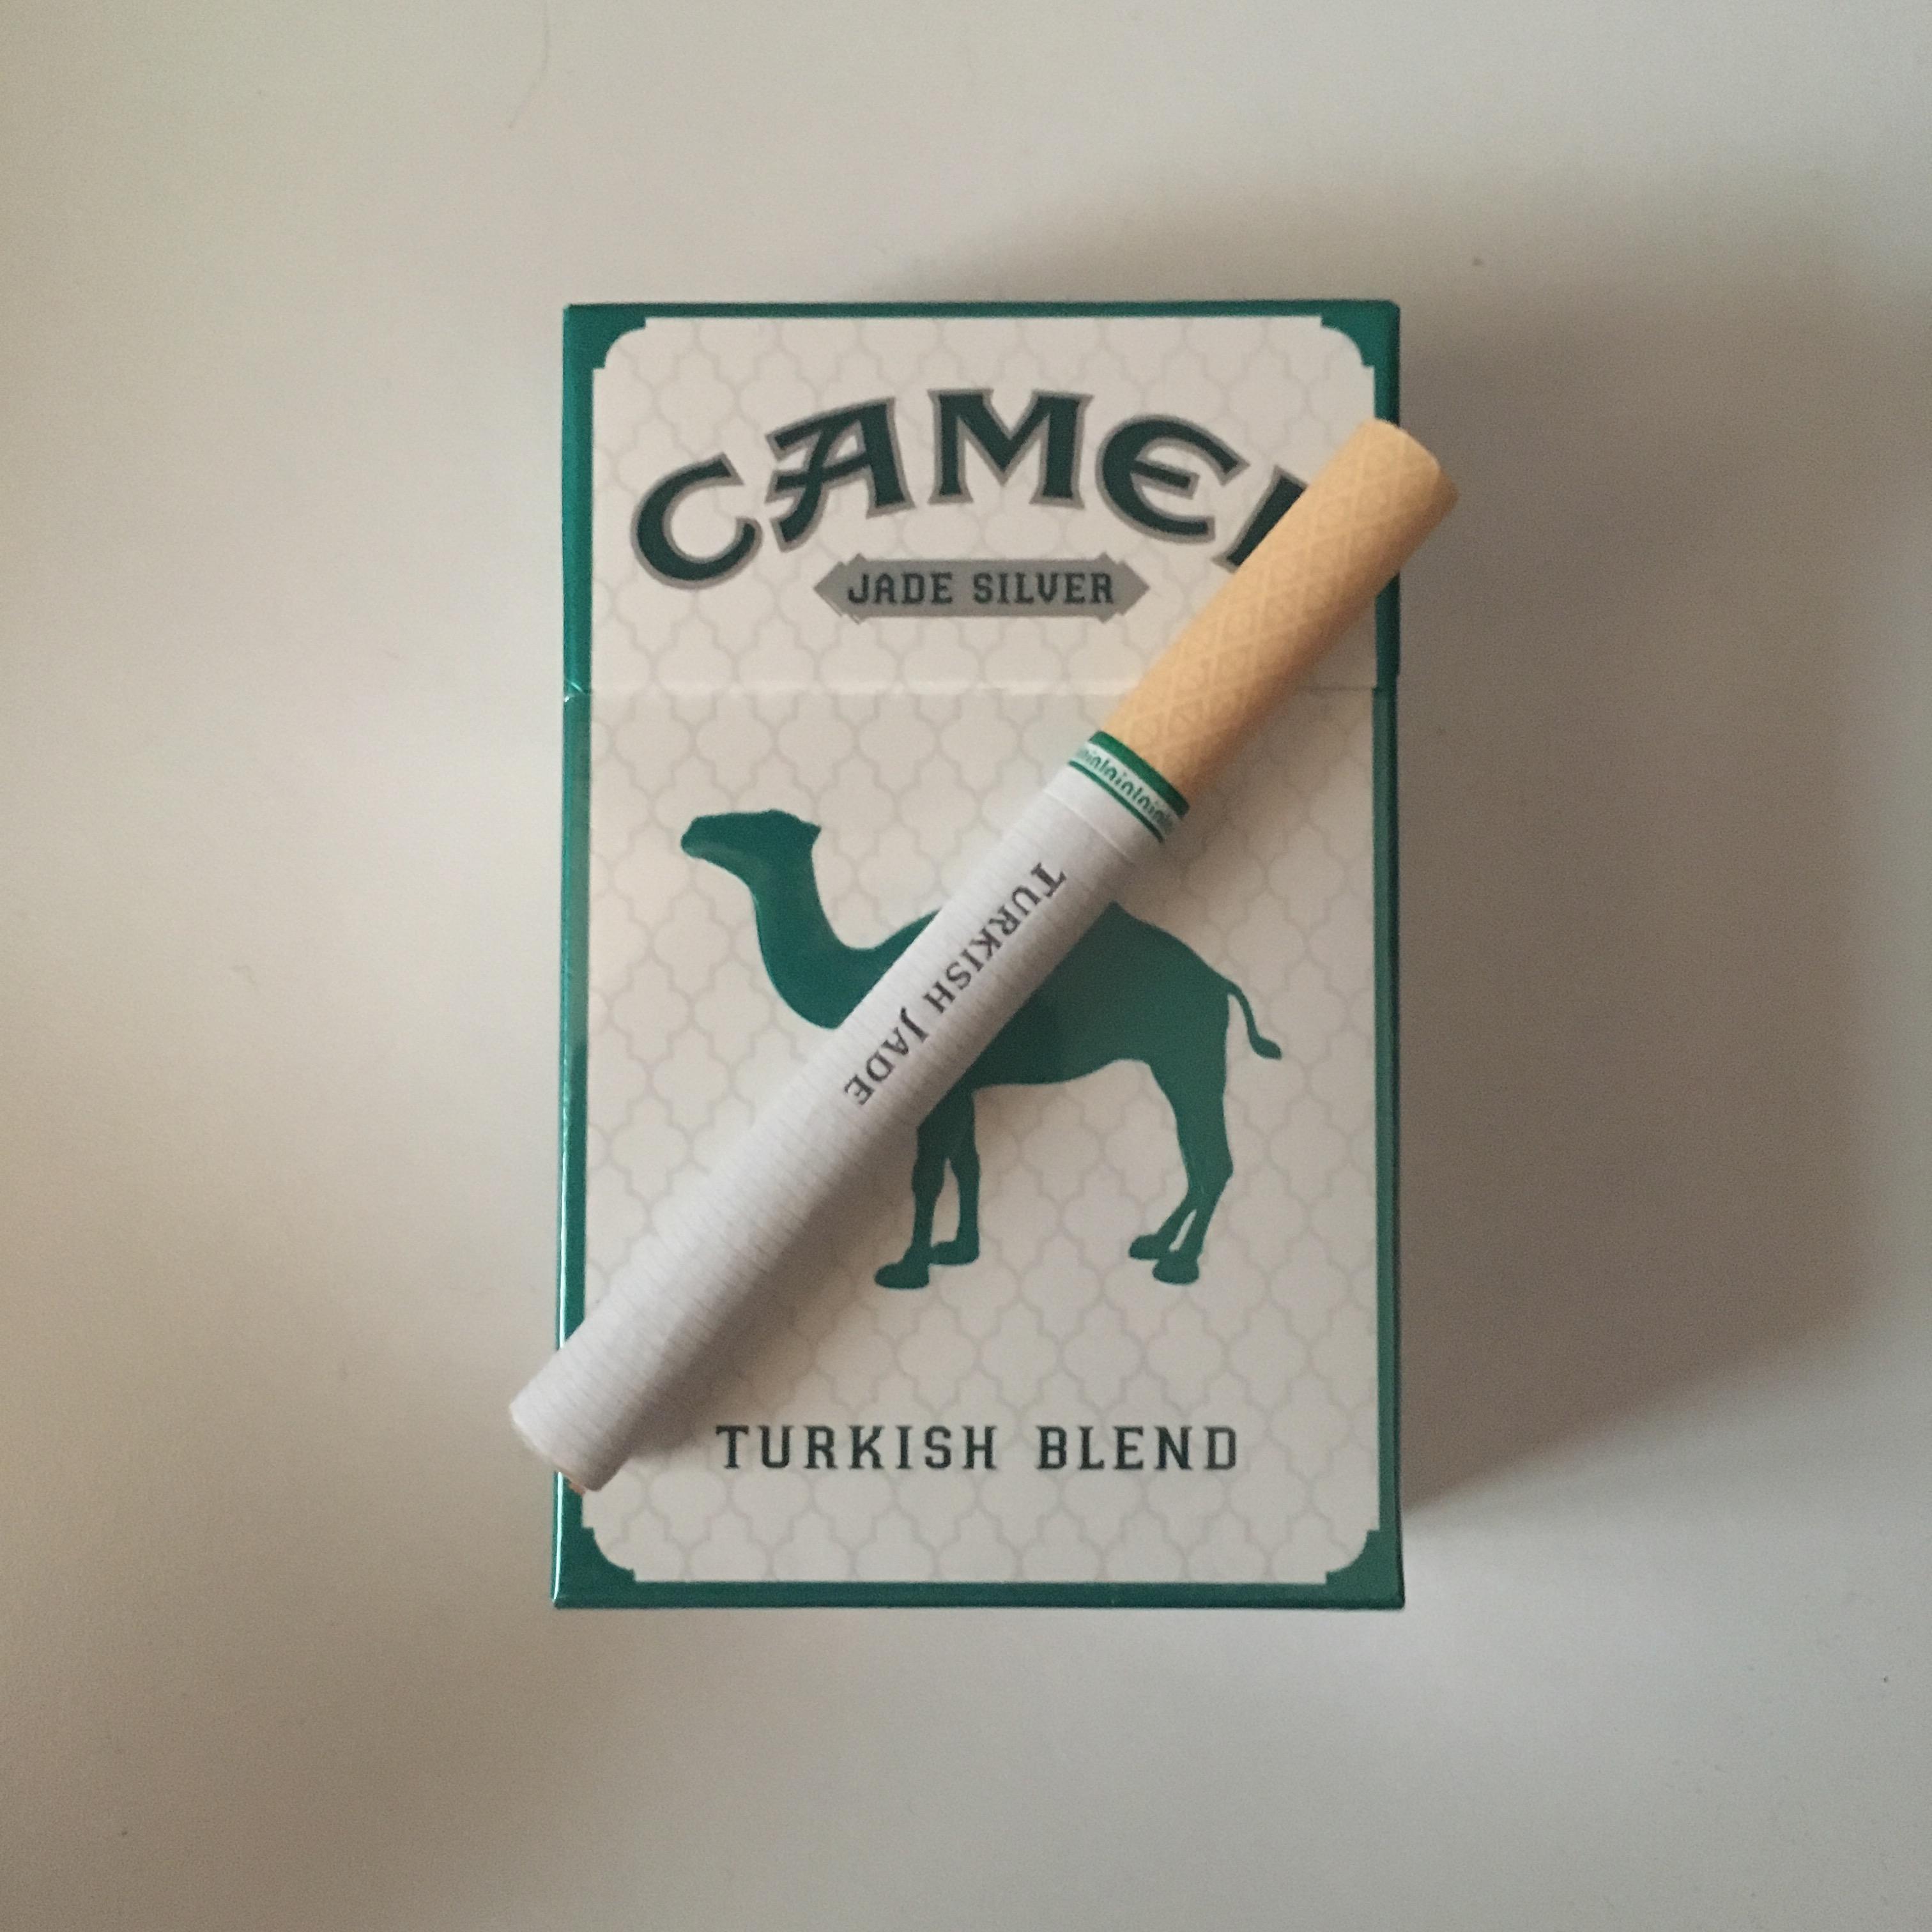 camel turkish jade silver